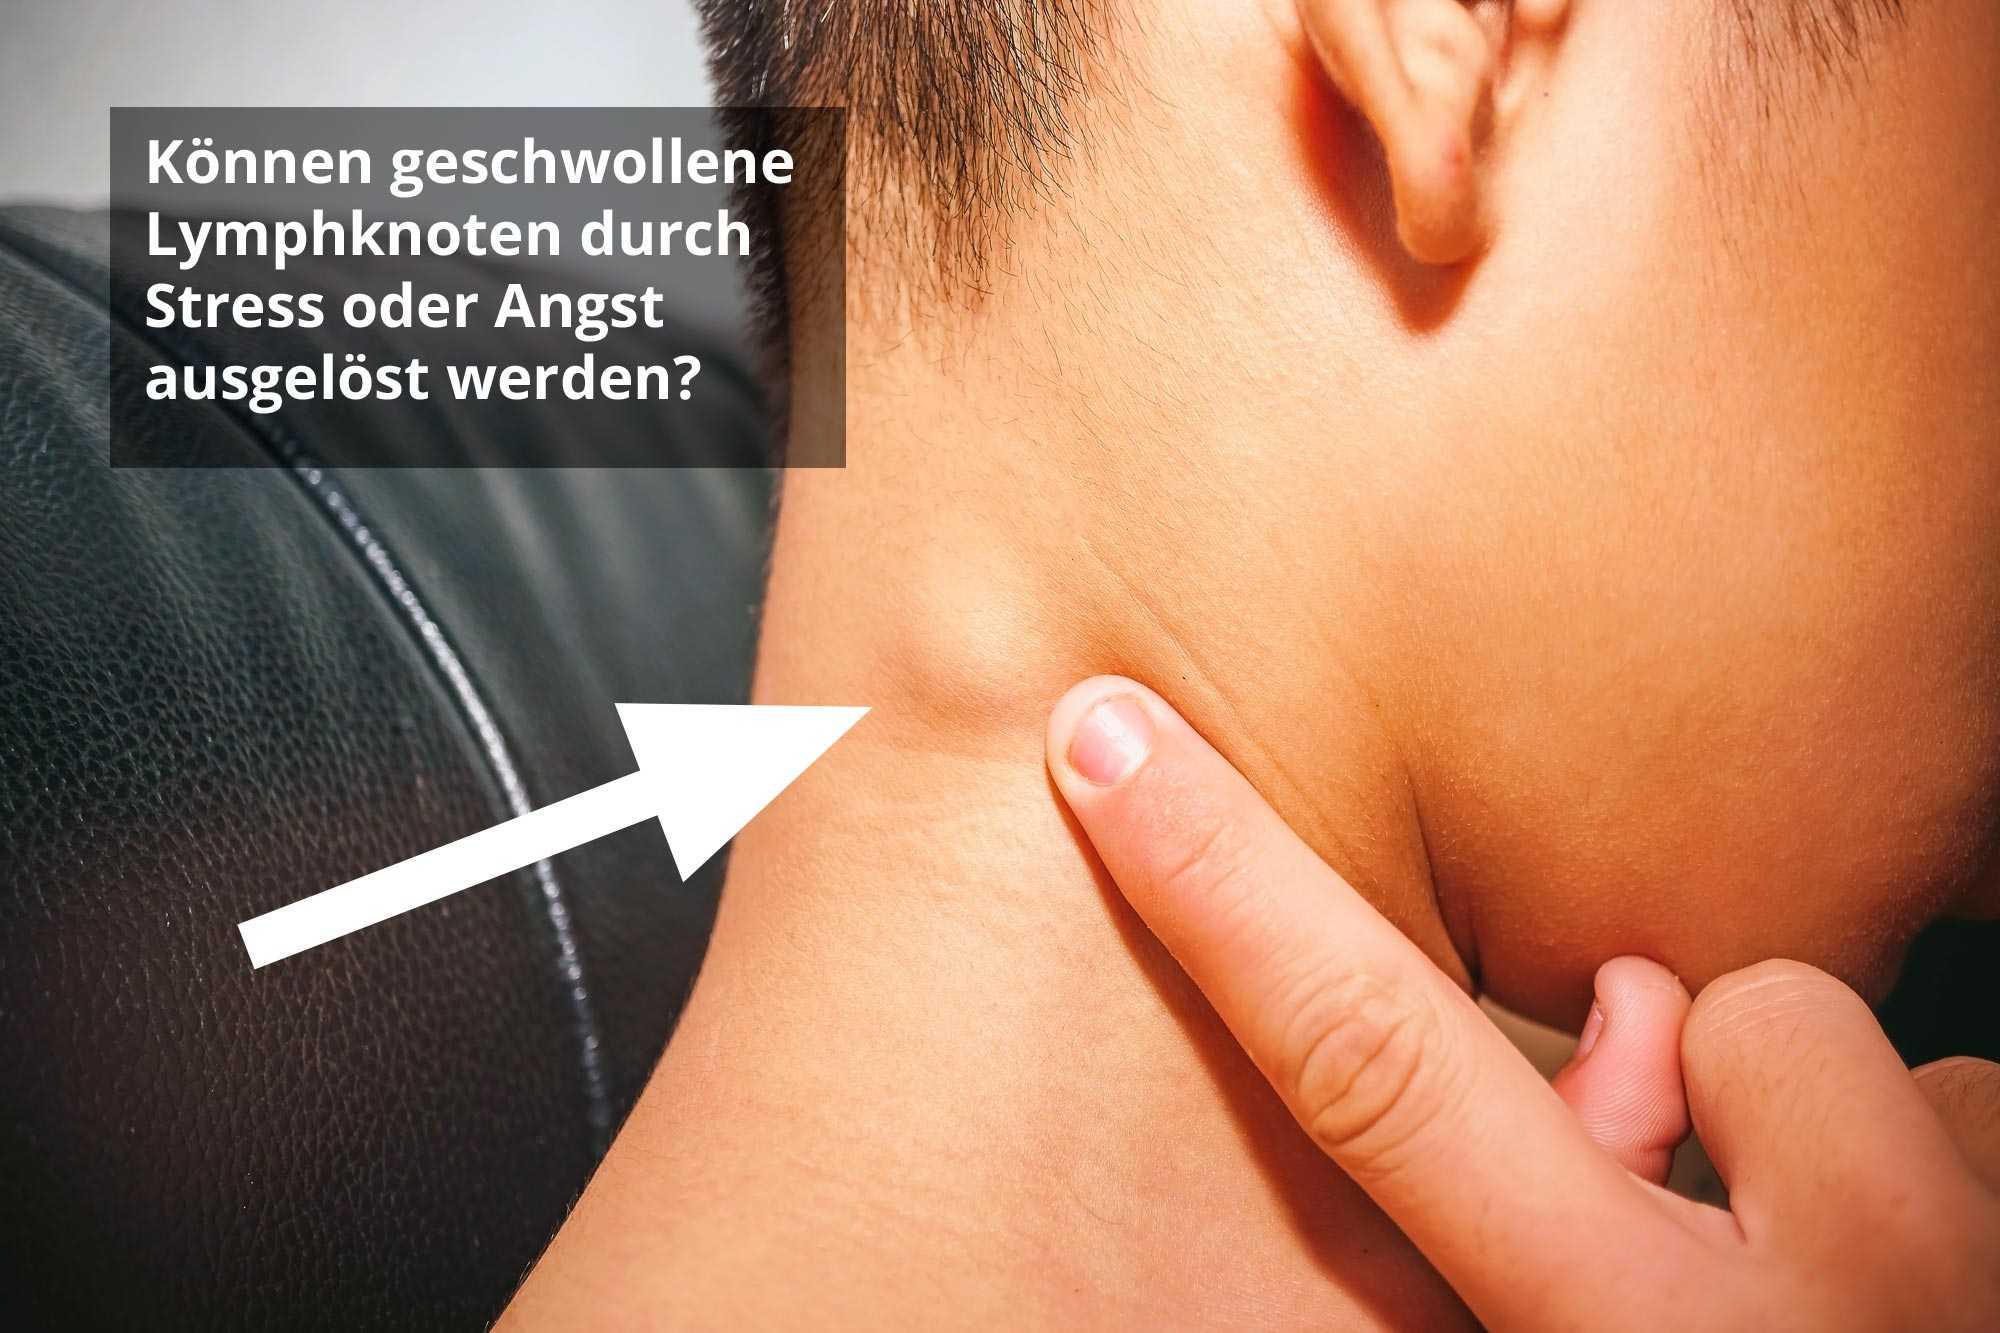 vergrößerter lymphknoten achsel